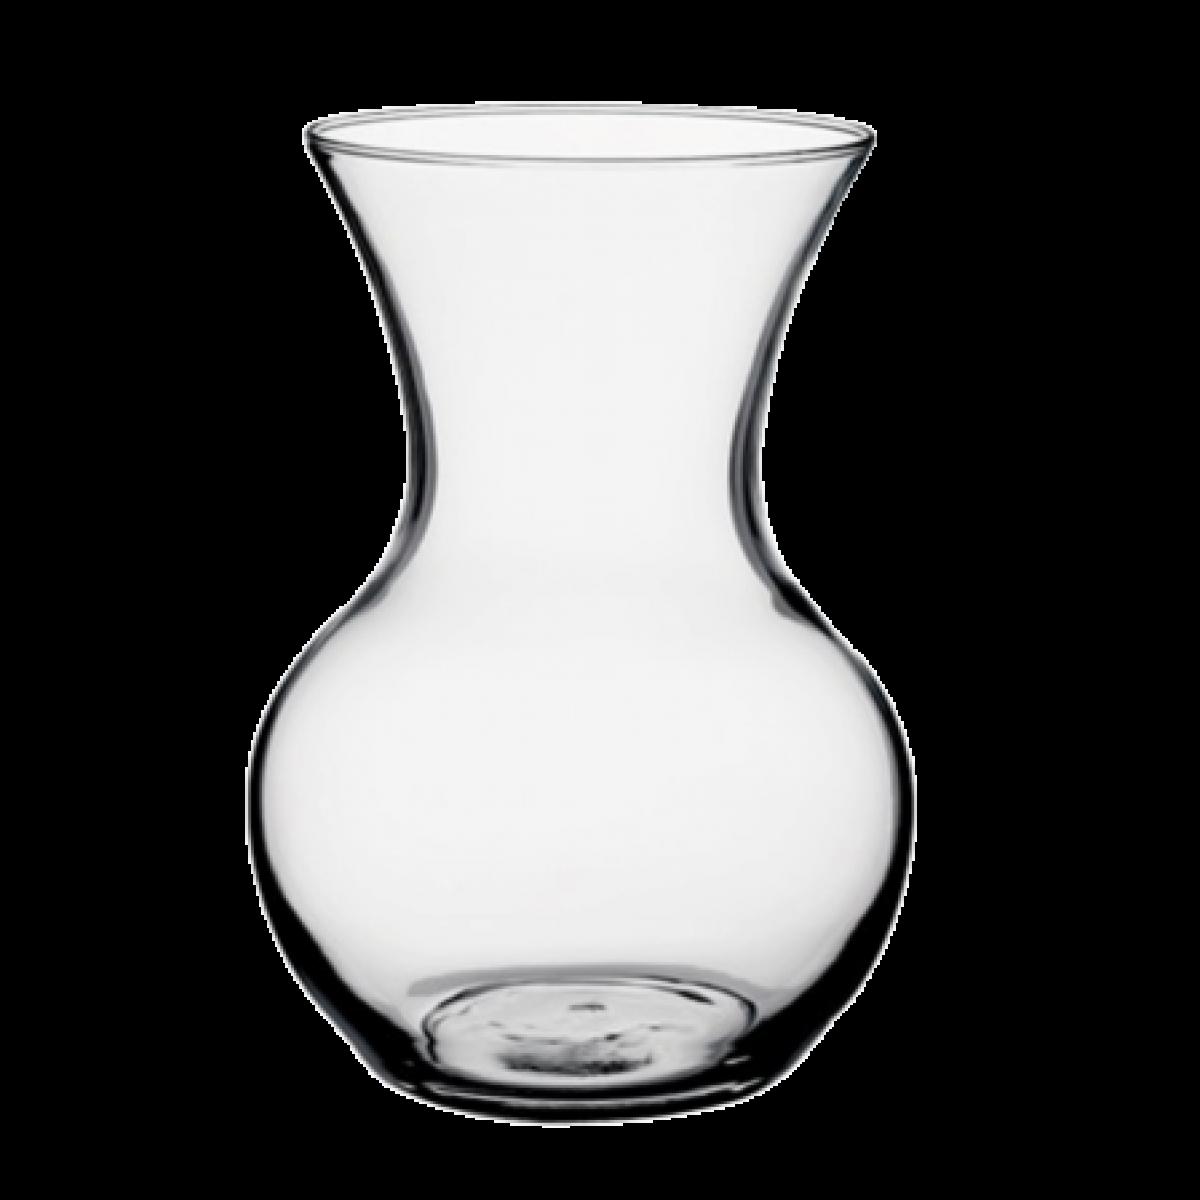 Sweetheart Clear 11x18cm Acrylic Vase - 1 No